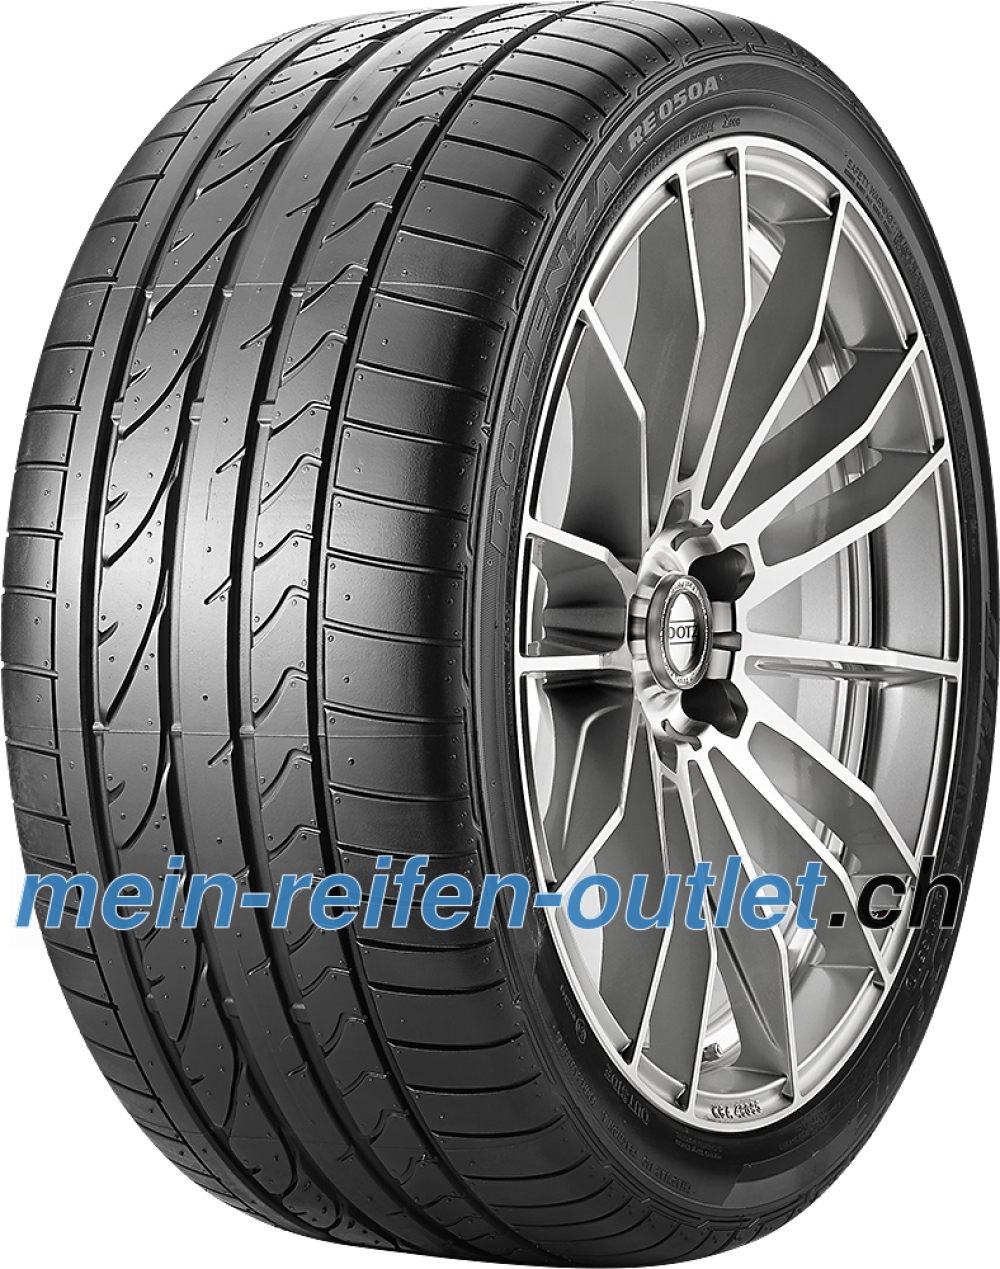 Bridgestone Potenza RE 050 A RFT ( 205/45 R17 88V XL *, runflat, mit Felgenschutz (MFS) )